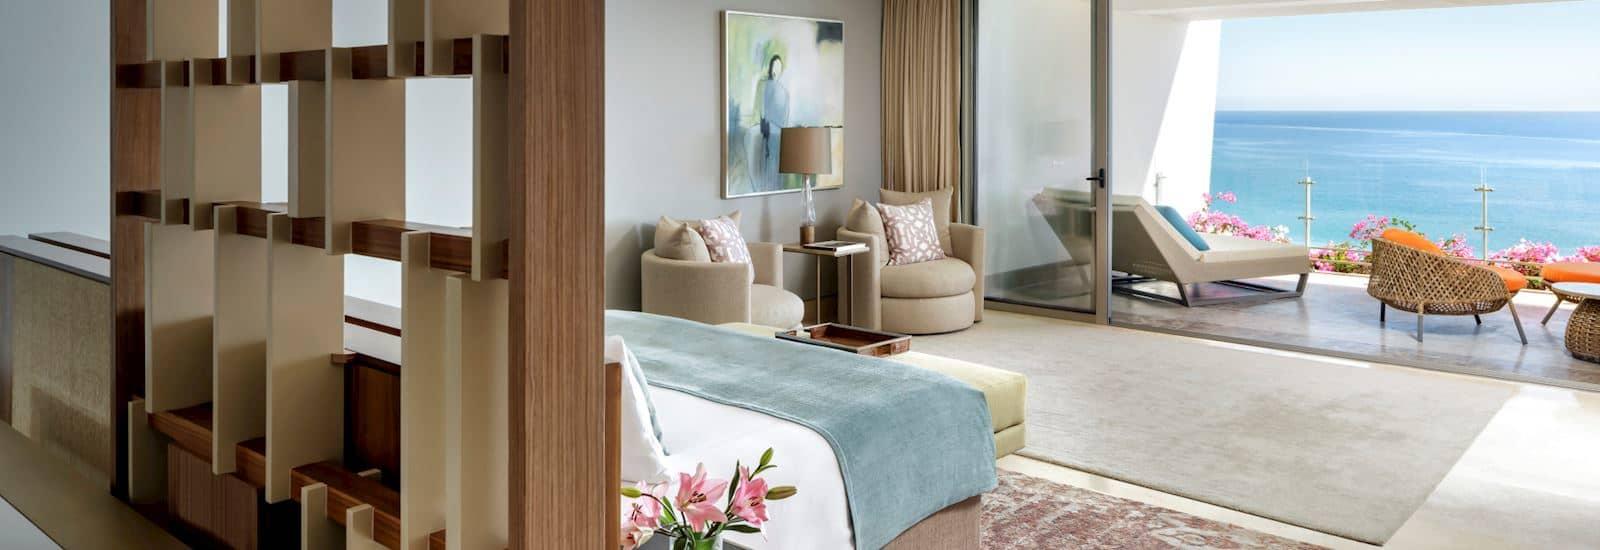 One Bedroom Governor Suite Ocean View - Grand Velas